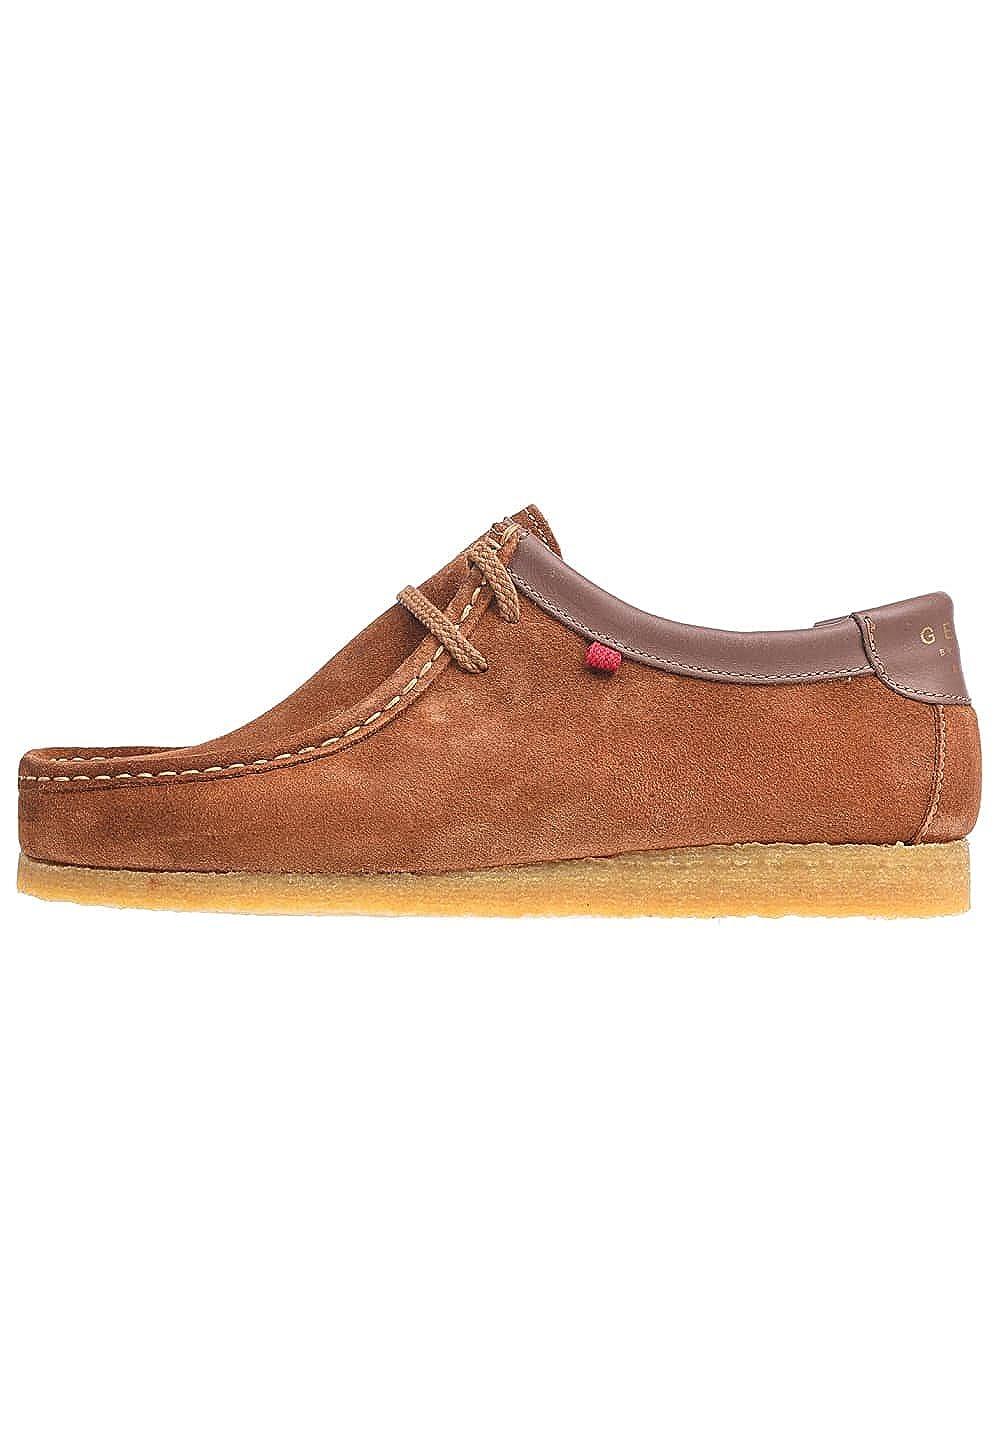 Djinns - Schuh - - - Genesiis Low Suede - Cognac Caramel 315057